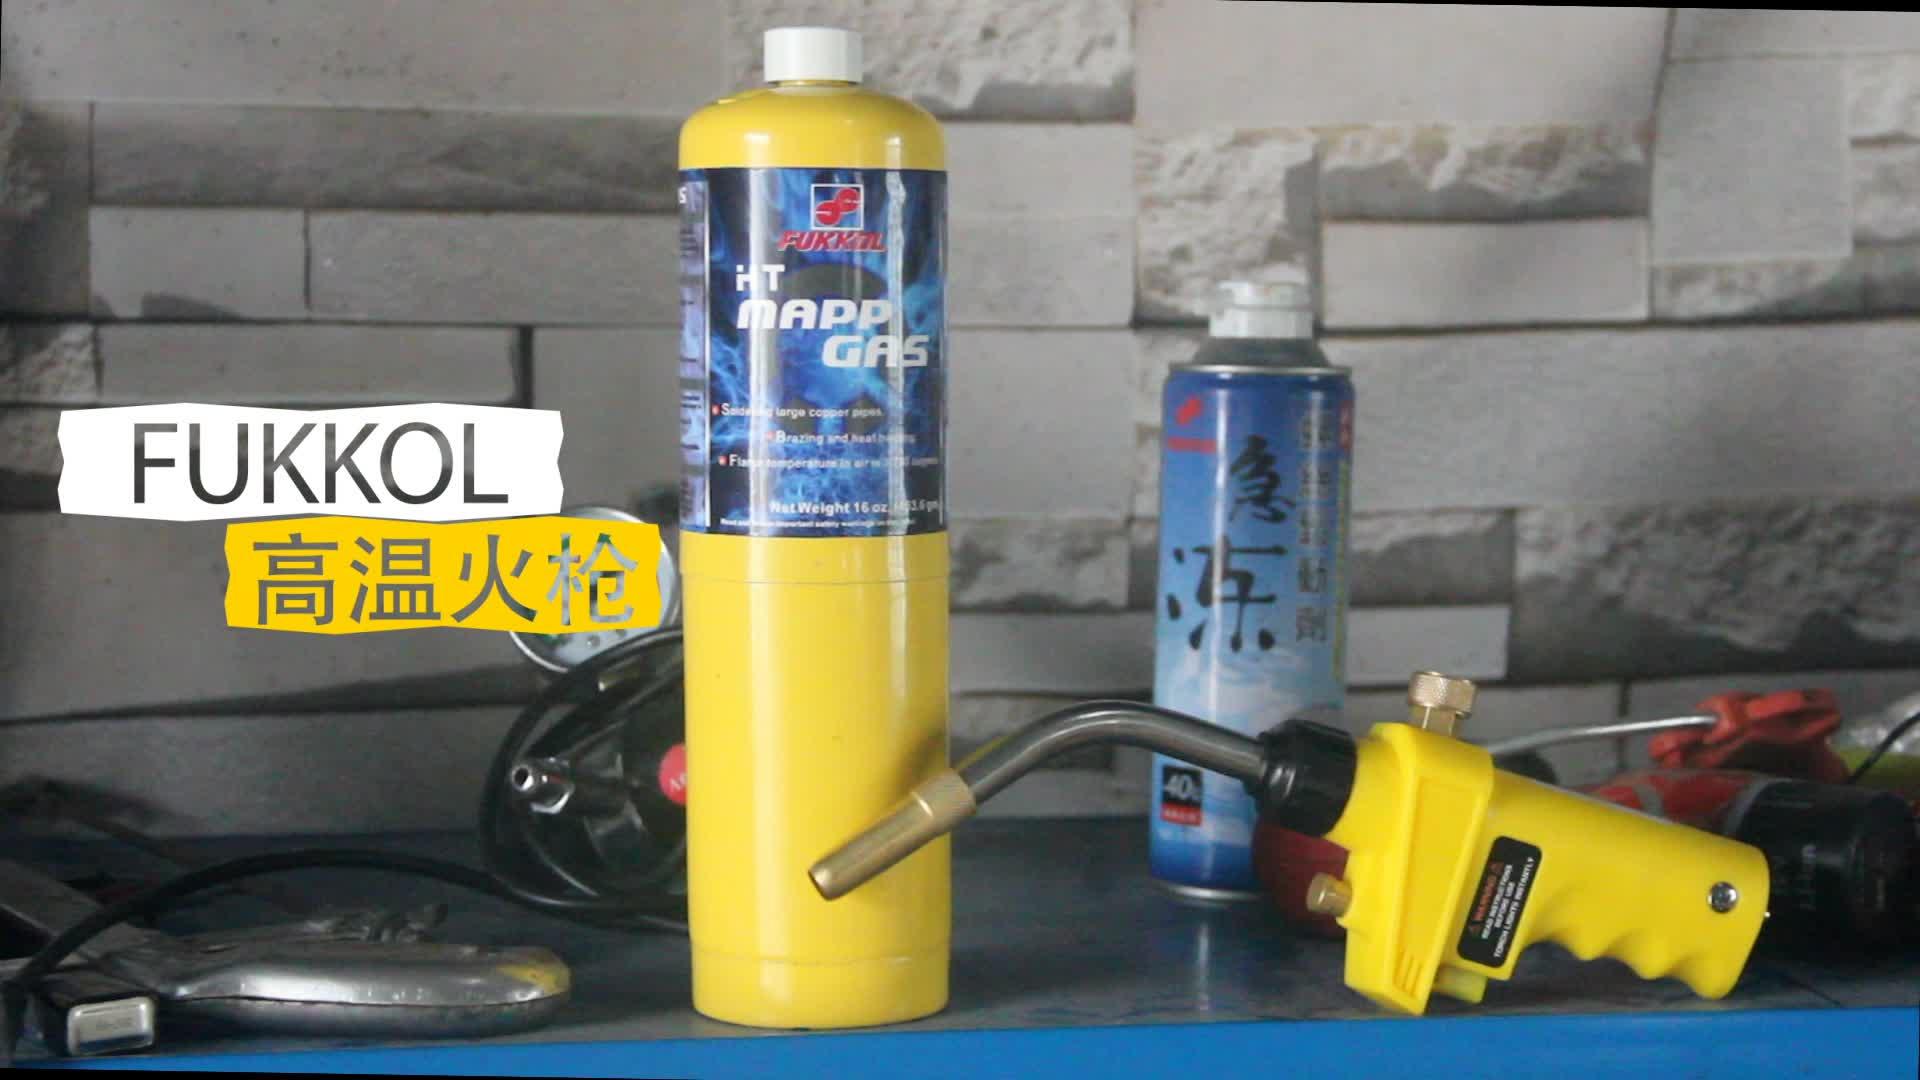 Fukkol Mapp pro gas price Mapp gas torch, propane torch cylinder